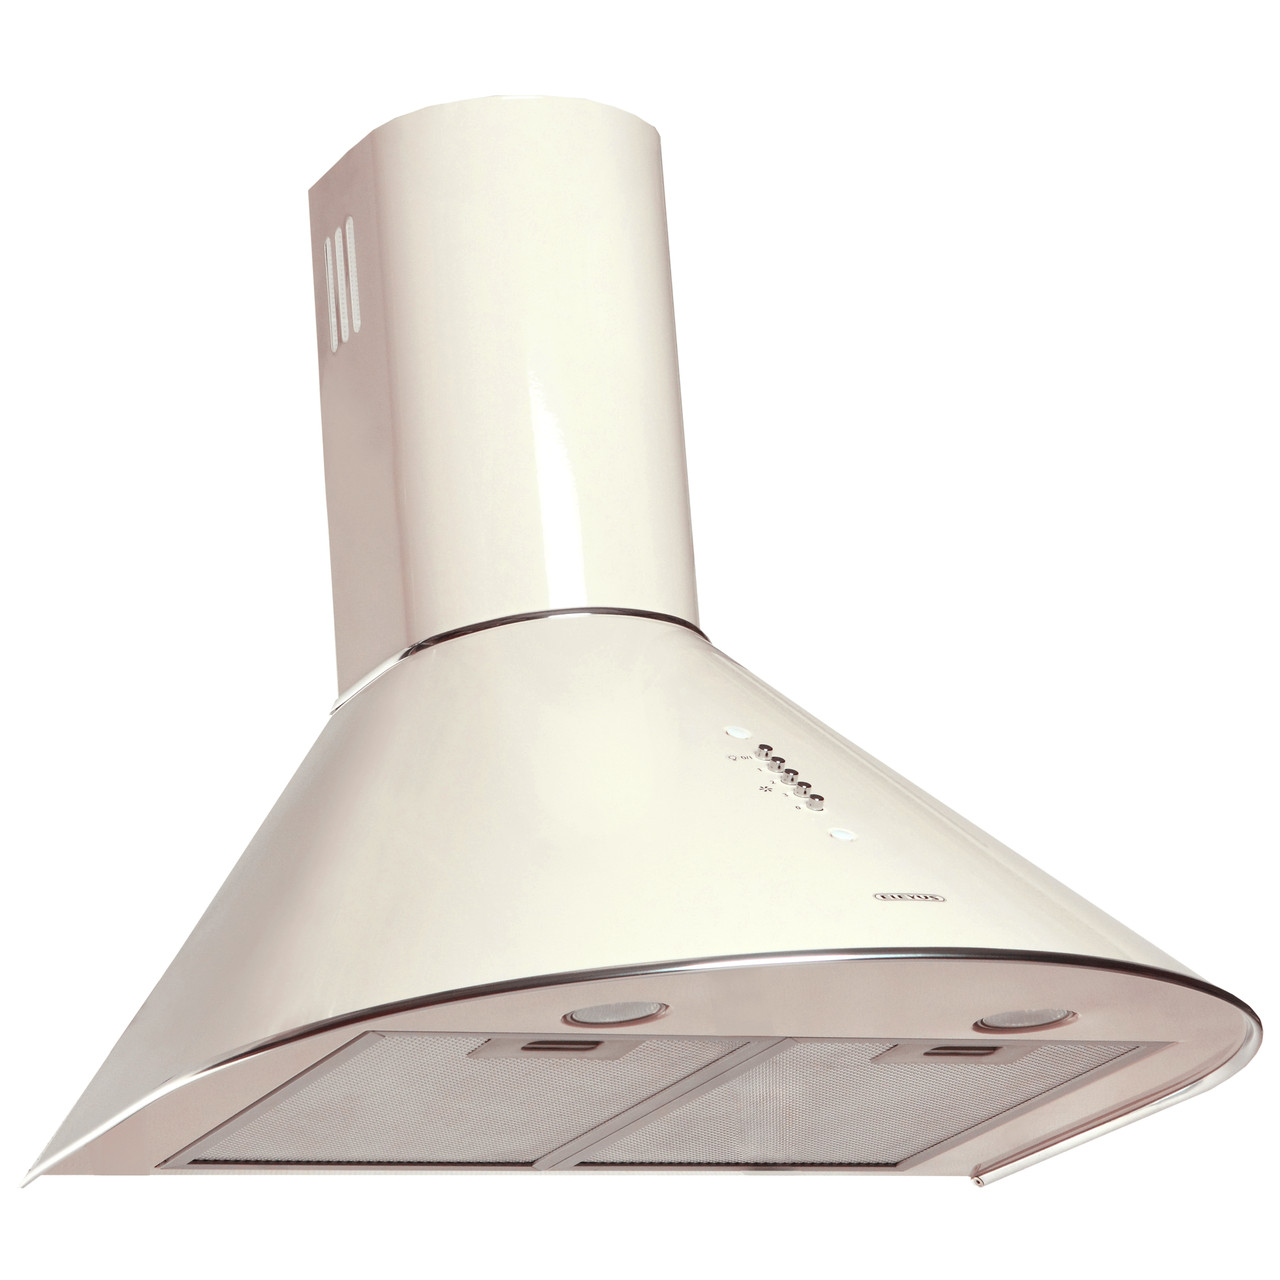 Витяжка кухонна купольна ELEYUS Viola 750 60 BG + Безкоштовна доставка!